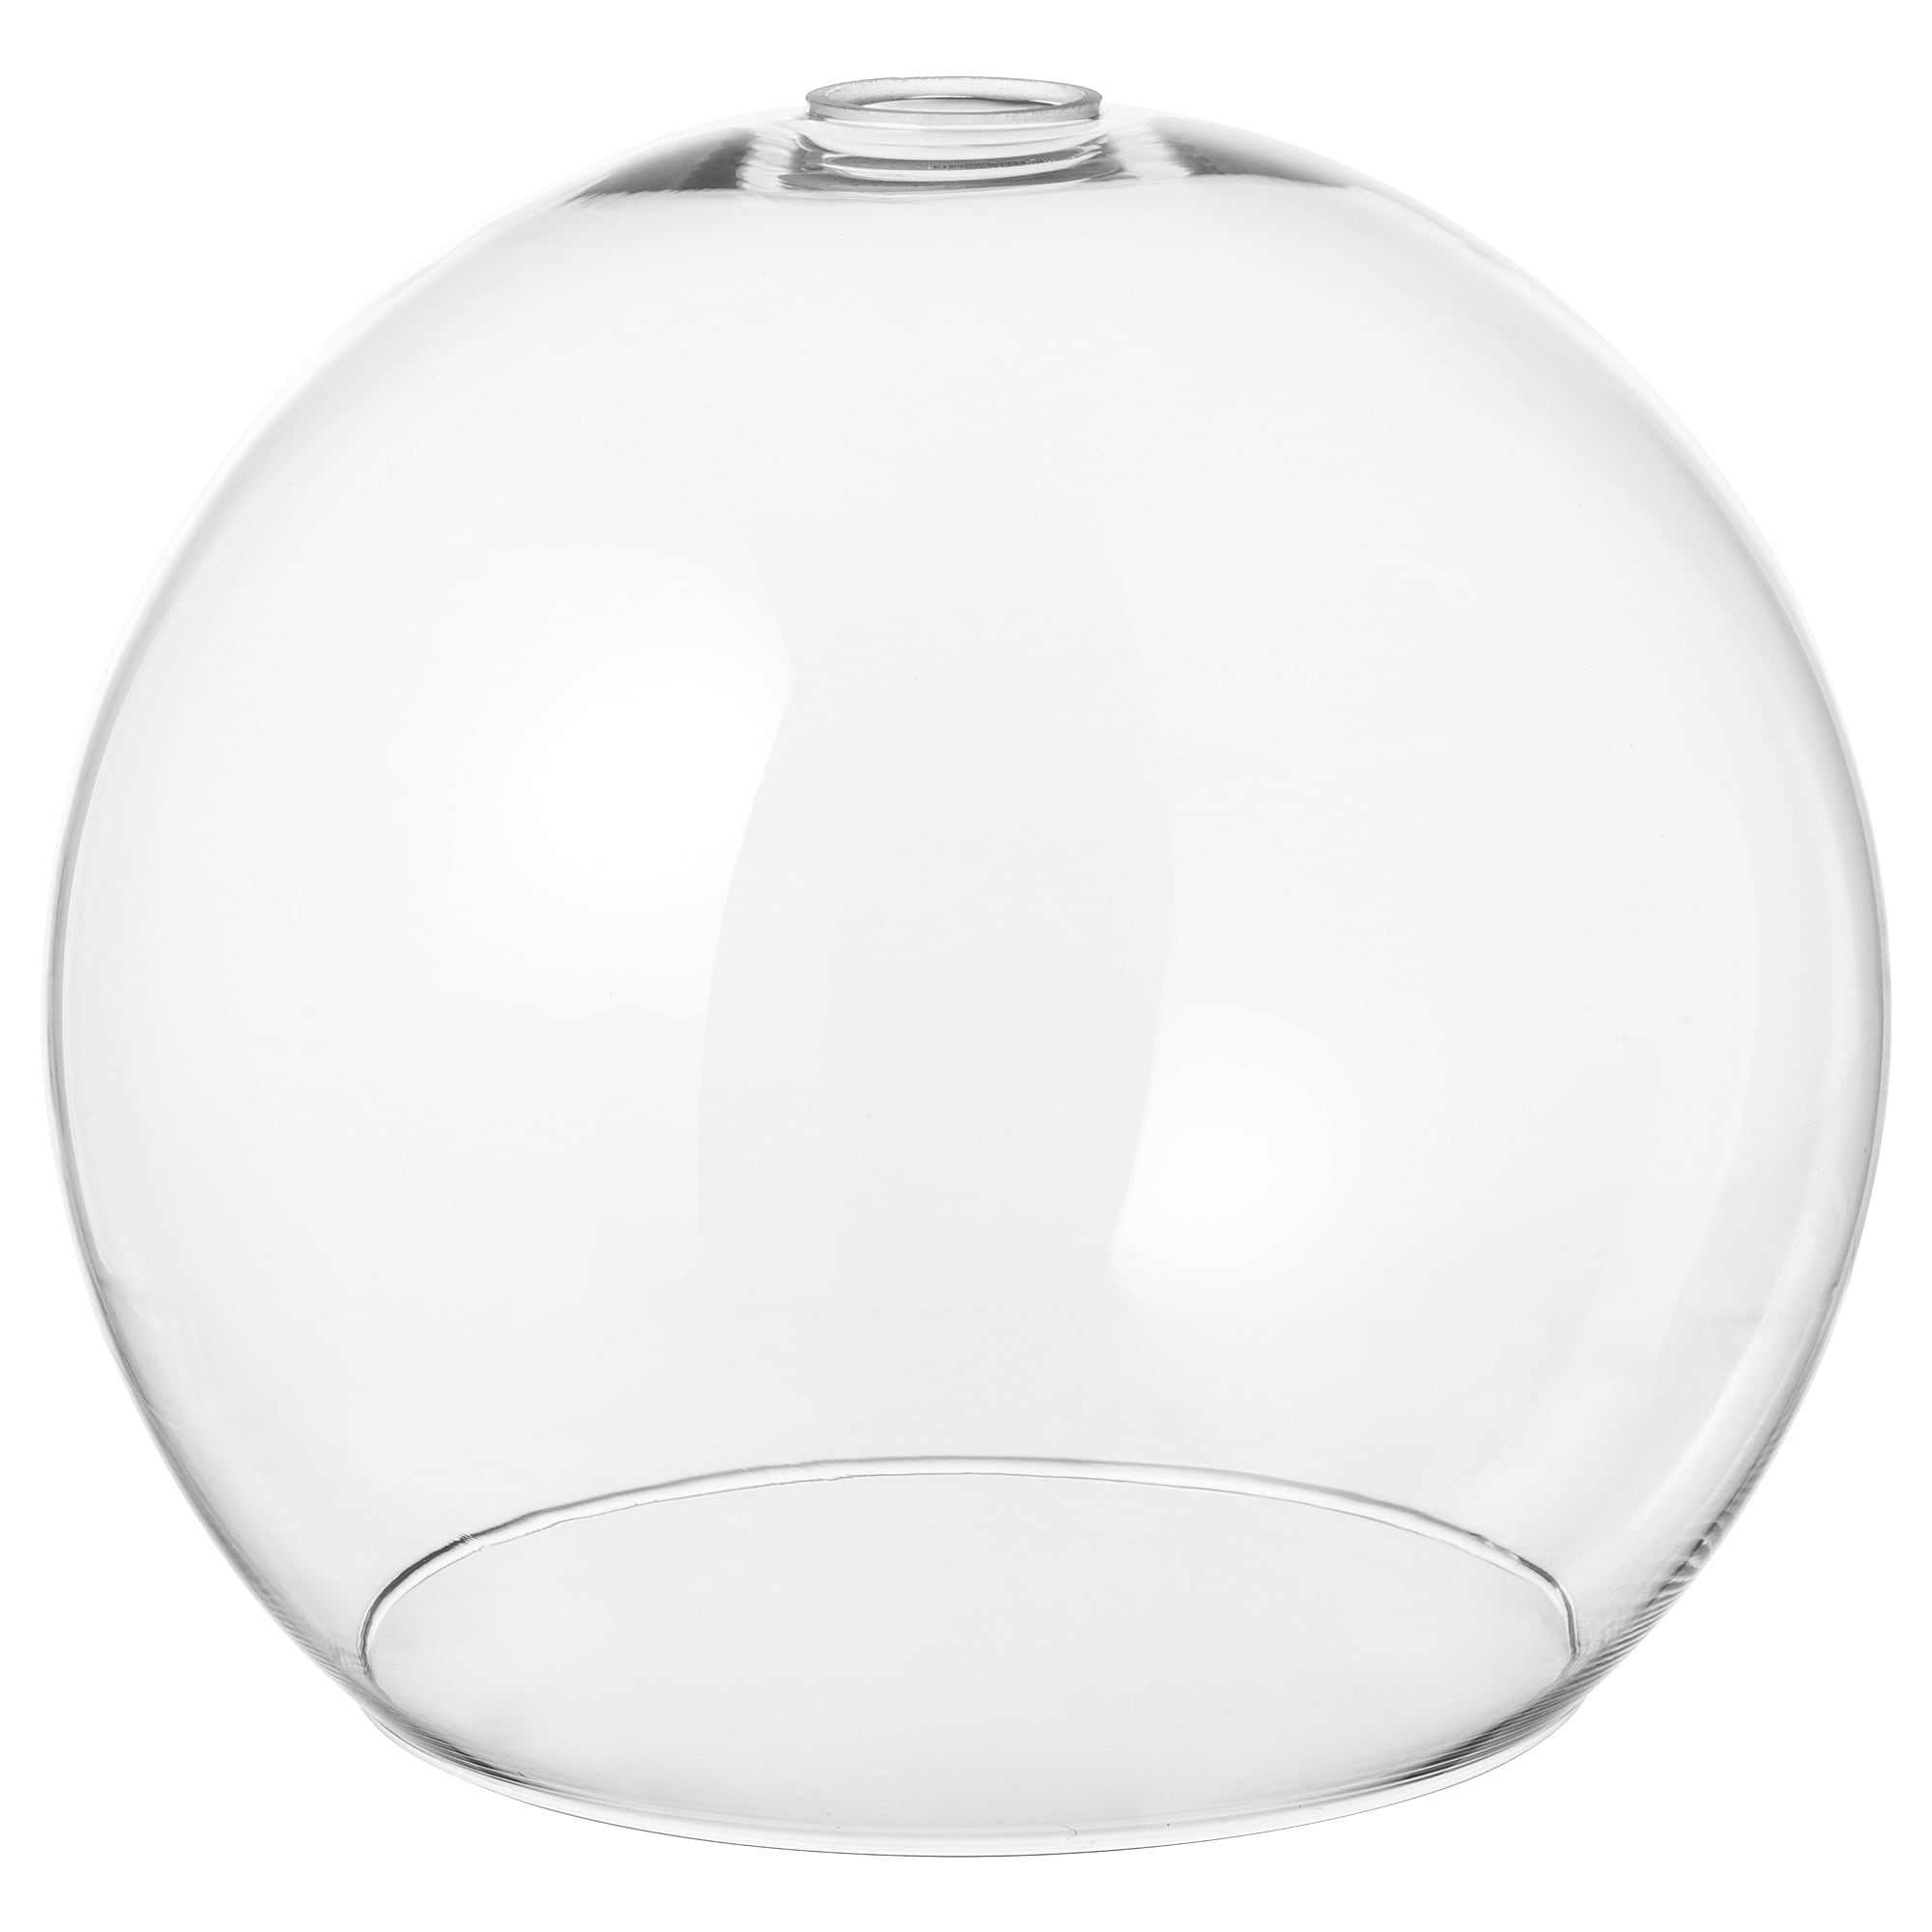 jakobsbyn-pendant-lamp-shade-clear-glass__0683771_pe720859_s5.jpg?f=g